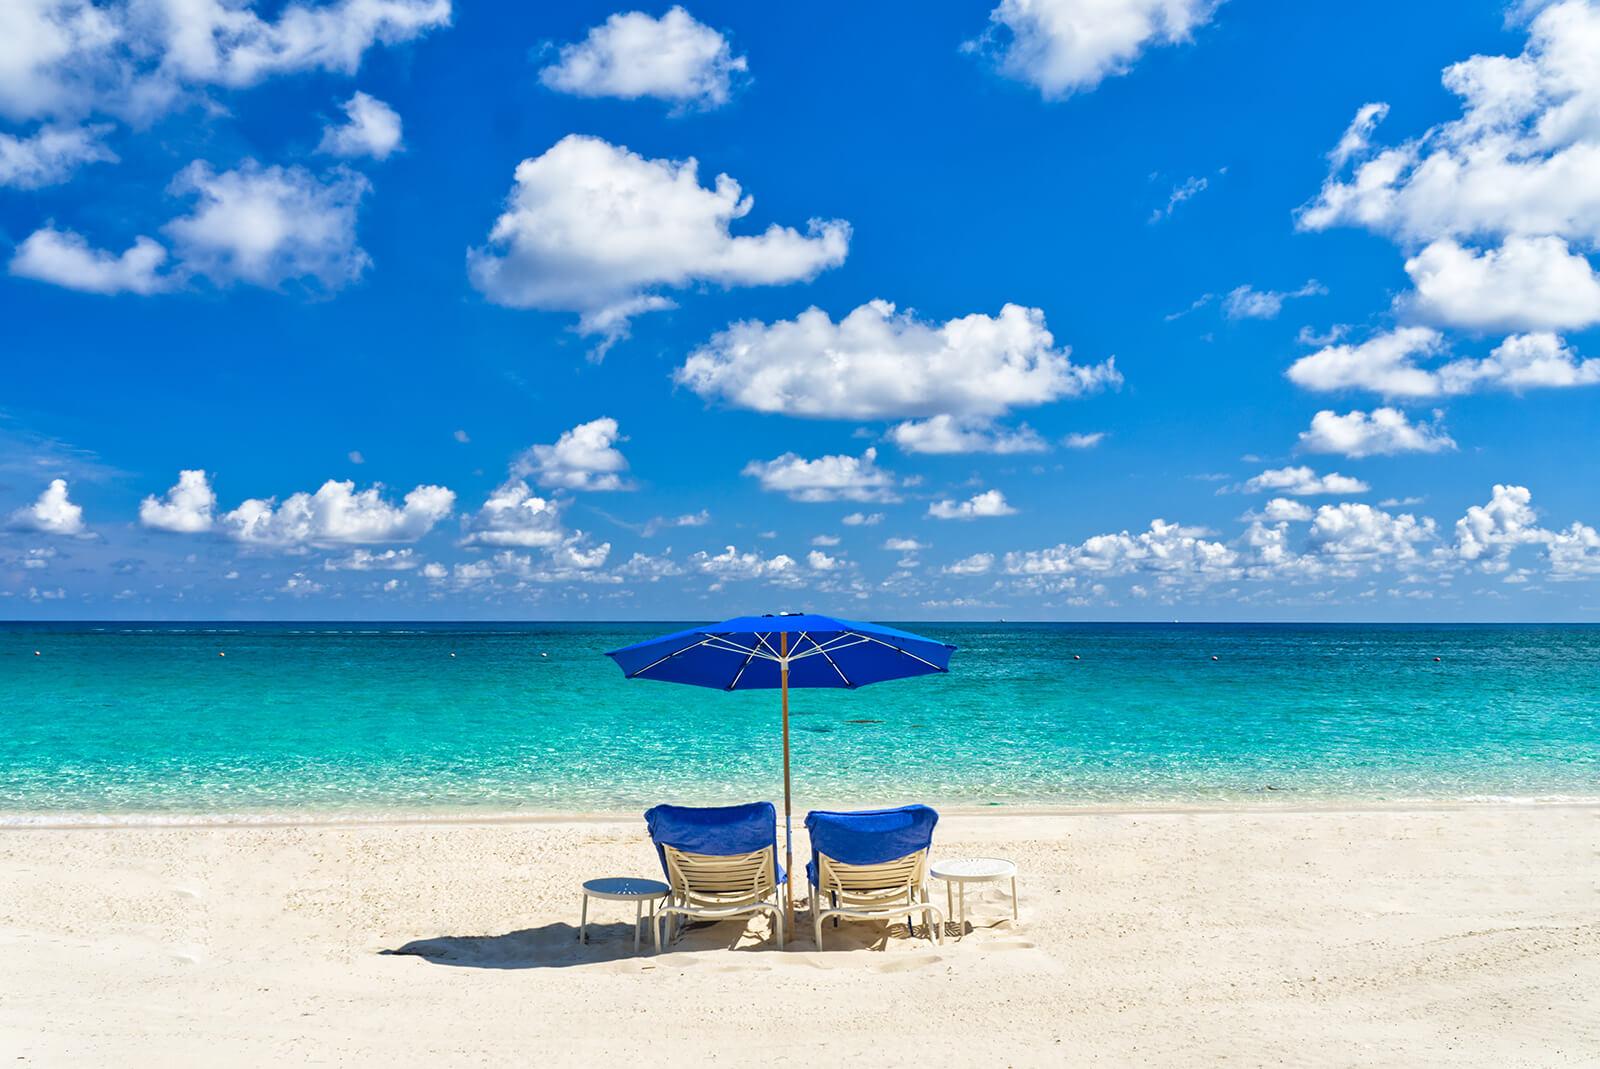 Enjoying these picturesque Bahamas beaches